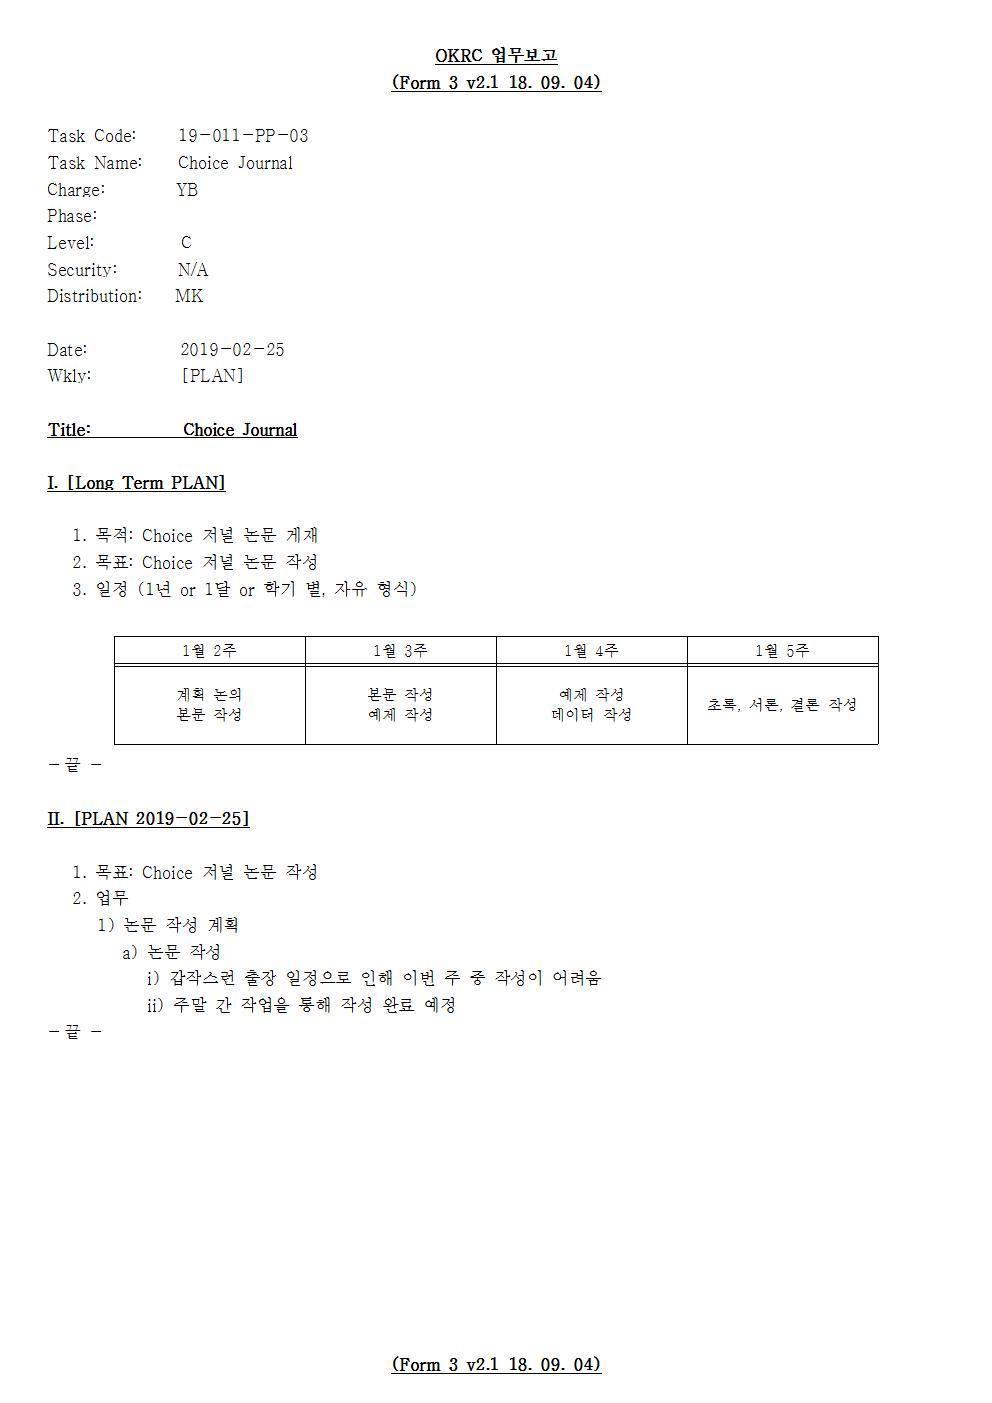 D-[19-011-PP-03]-[Choice Journal]-[2019-02-25][YB]001.jpg